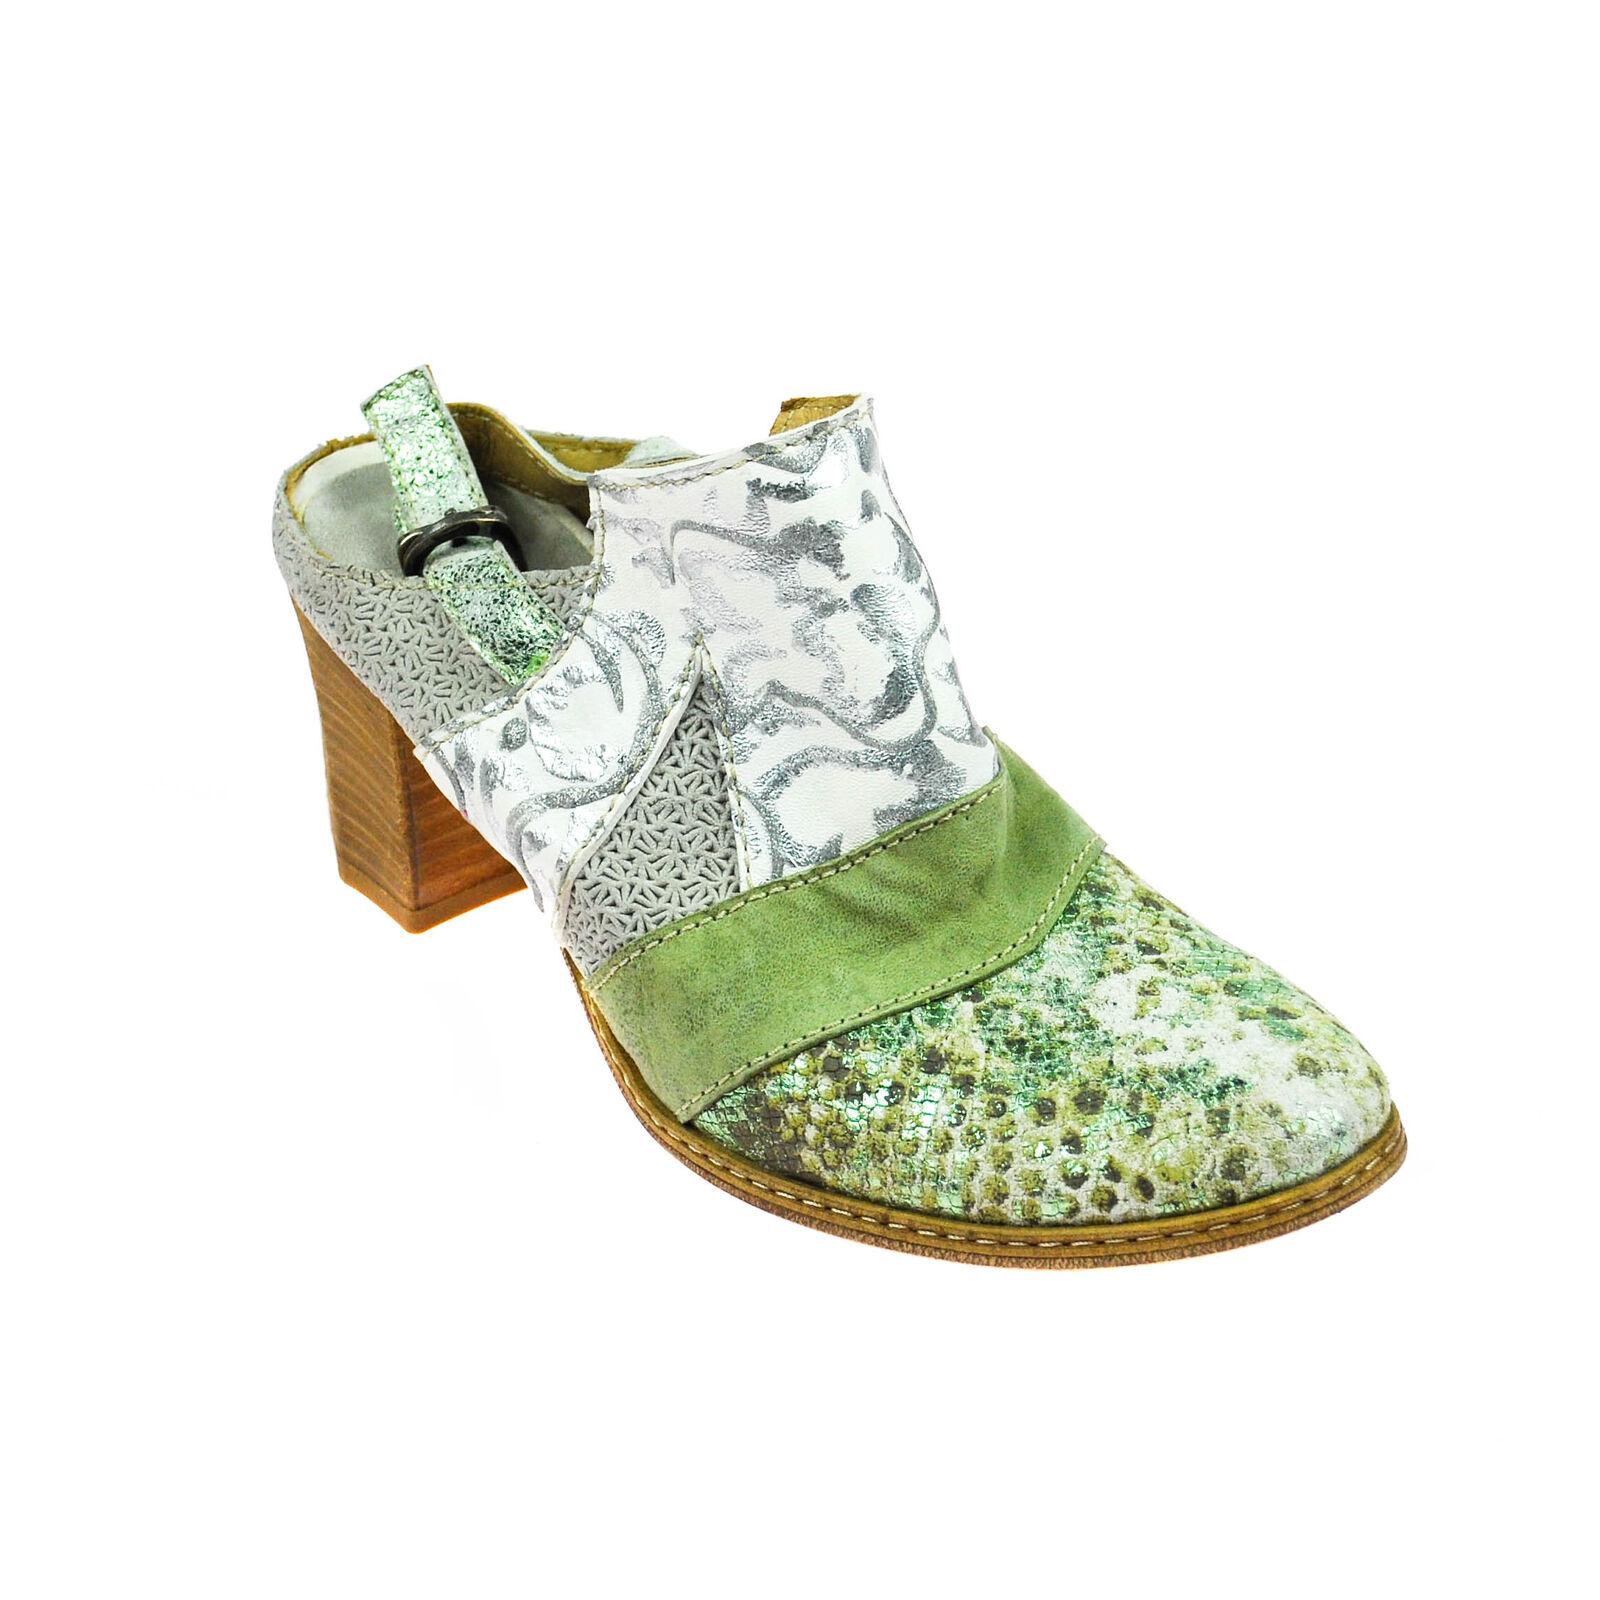 Charme Damen Halbschuhe offen Sandalen Leder Silber Weiß Grün Grau Mehrfarbig